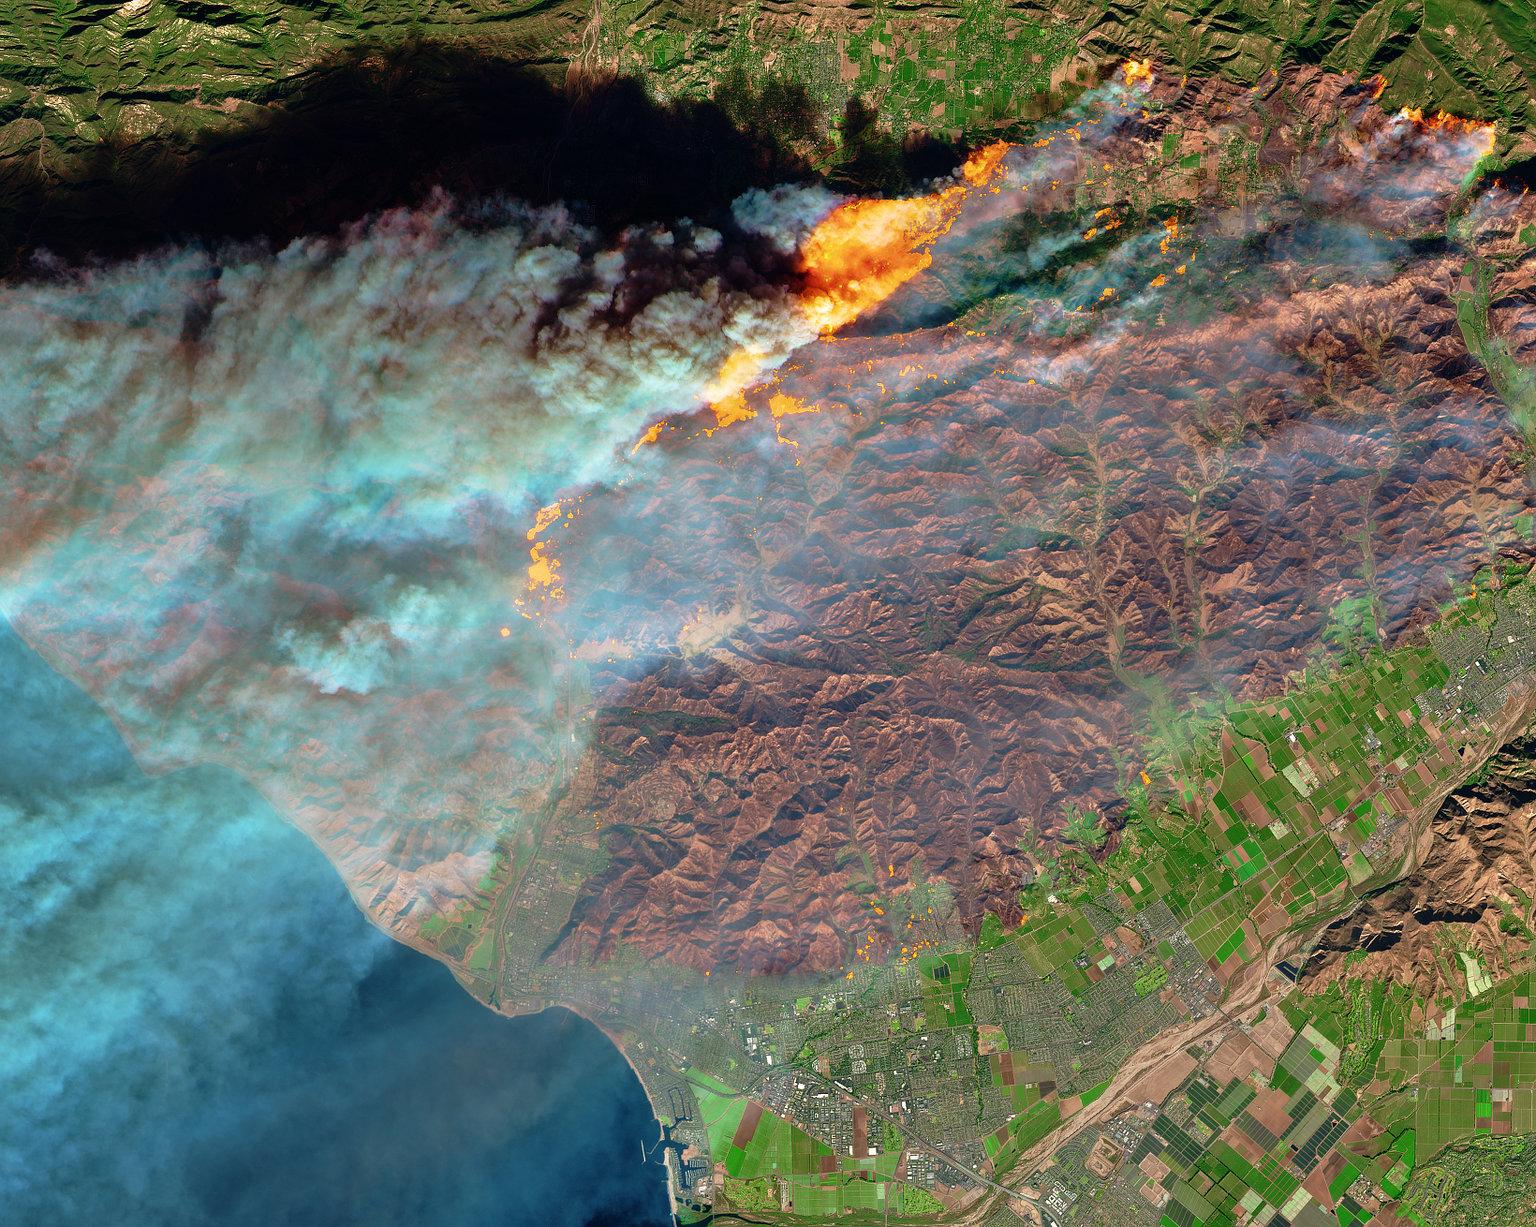 5a2ecd0ea3b47488378b4ee9-1536-1227 California Burning.jpg